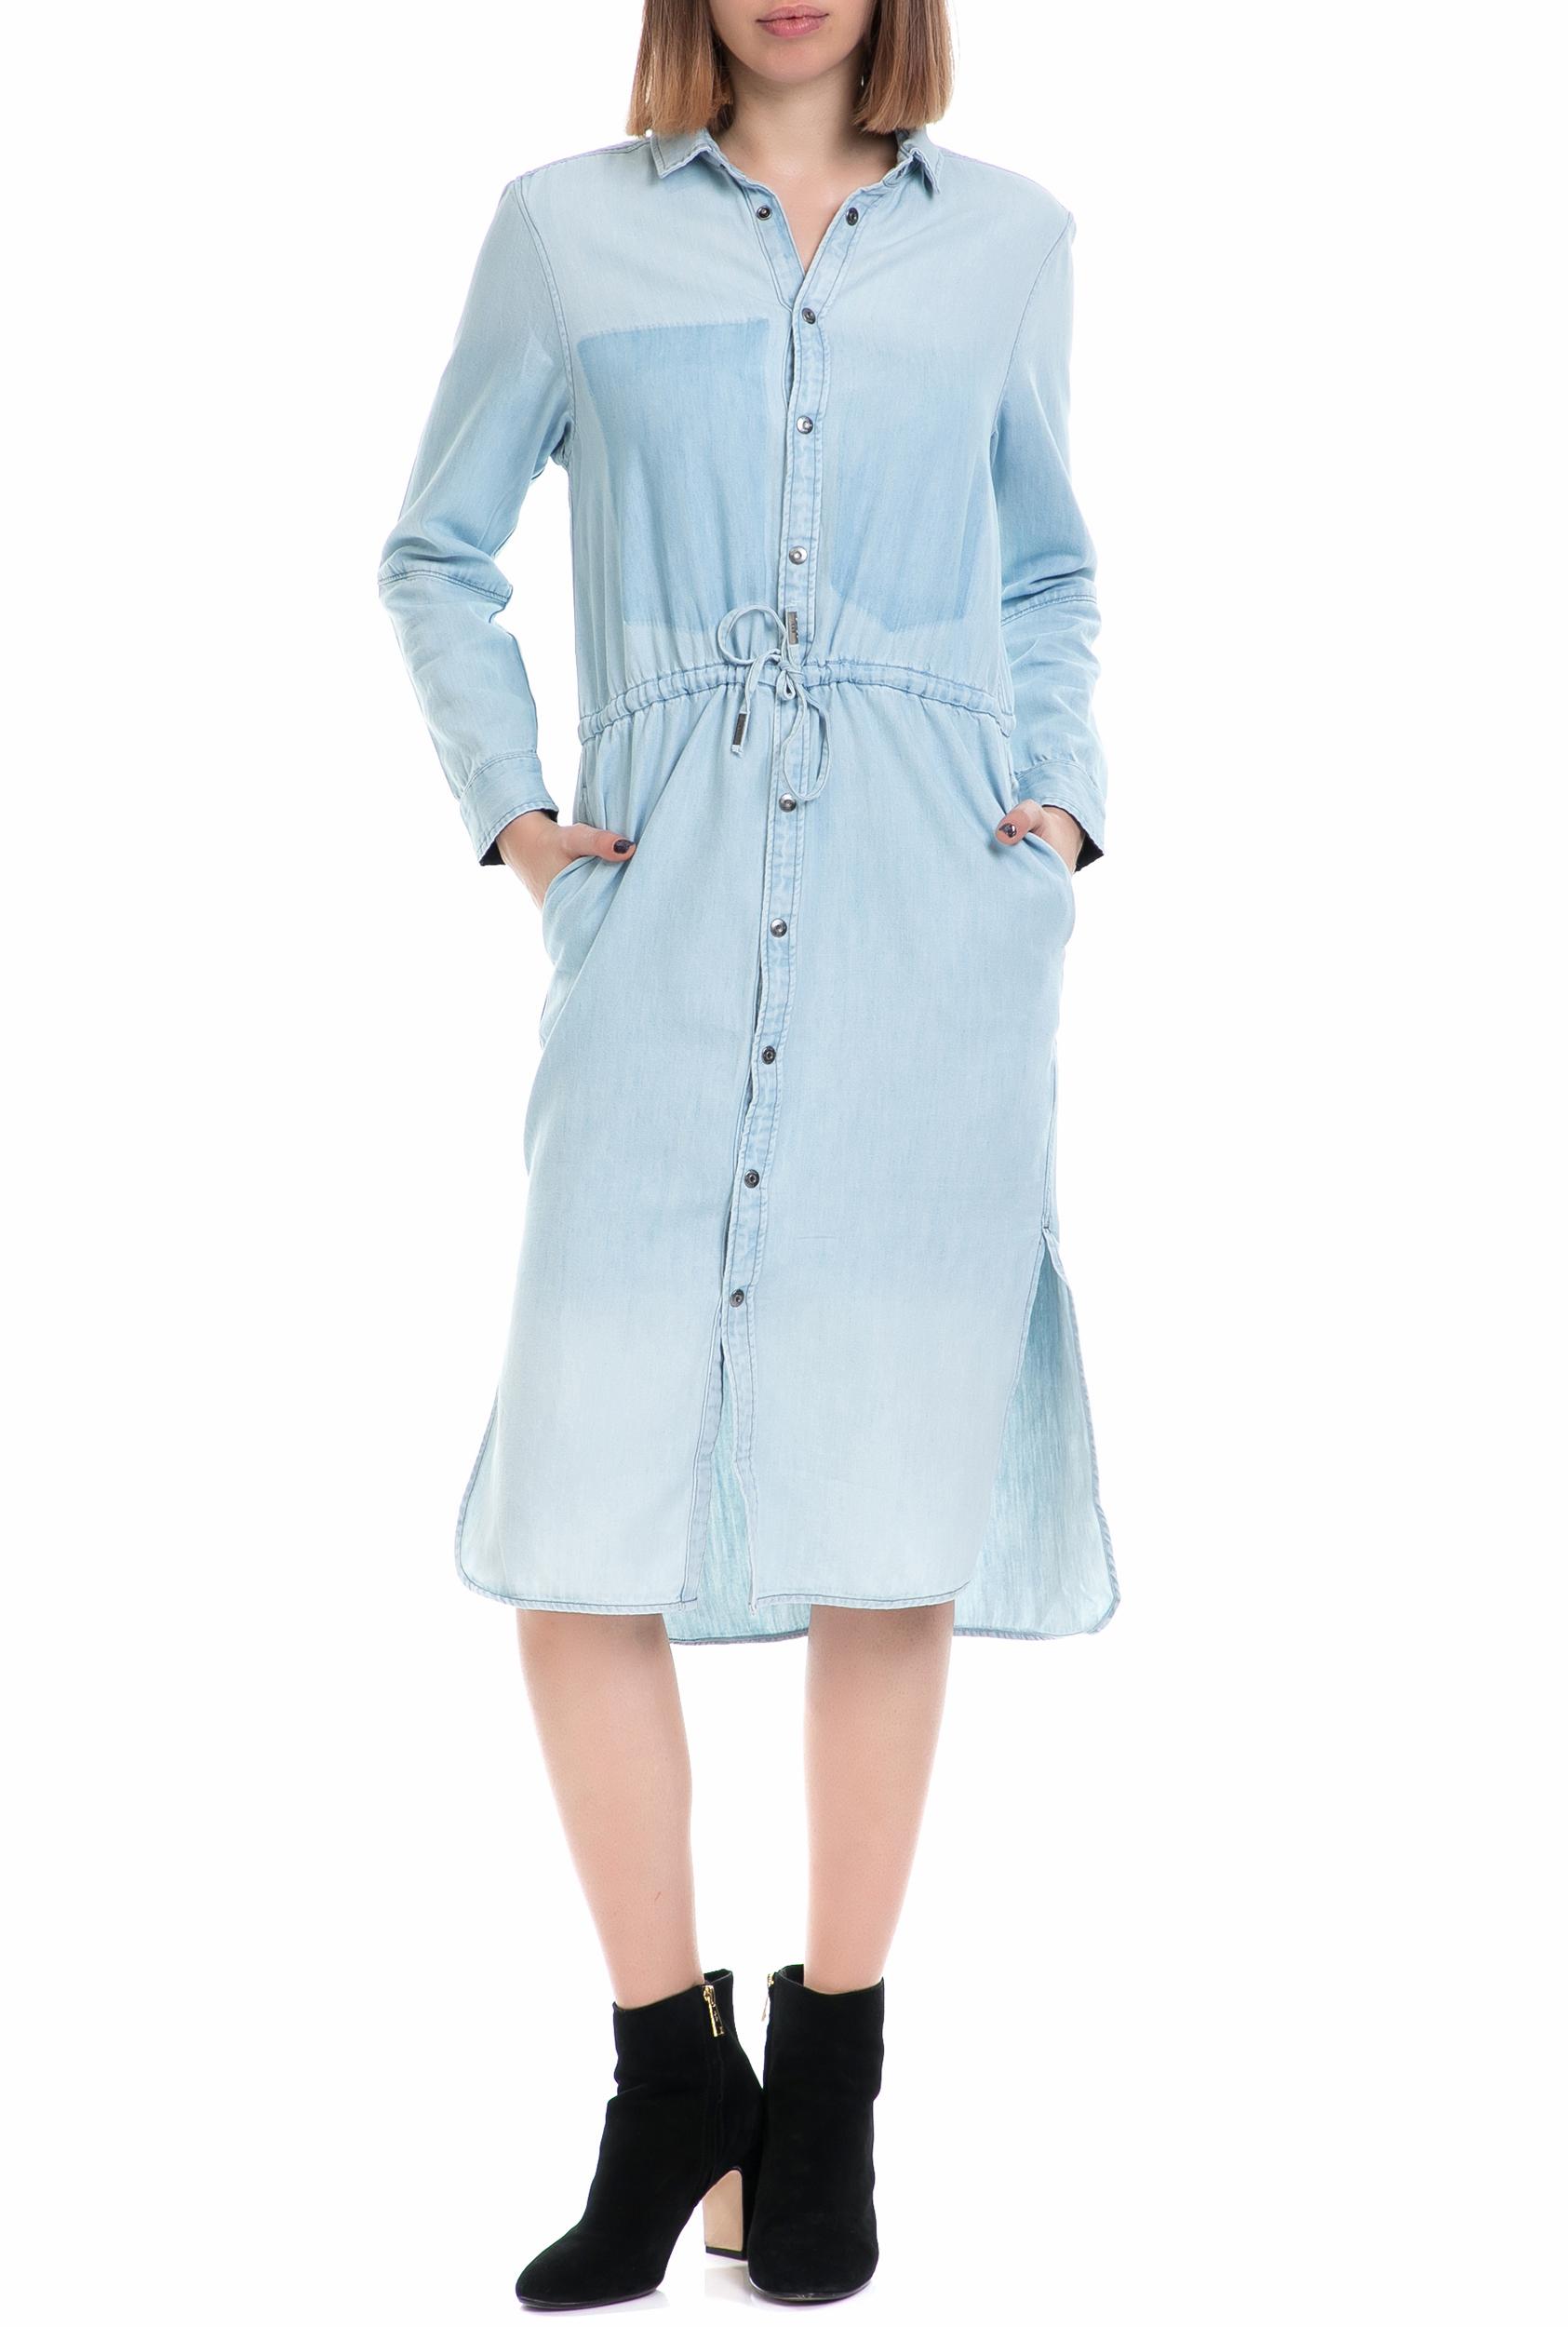 G-STAR - Γυναικείο τζιν φόρεμα Modern Arc 3D G-STAR μπλε